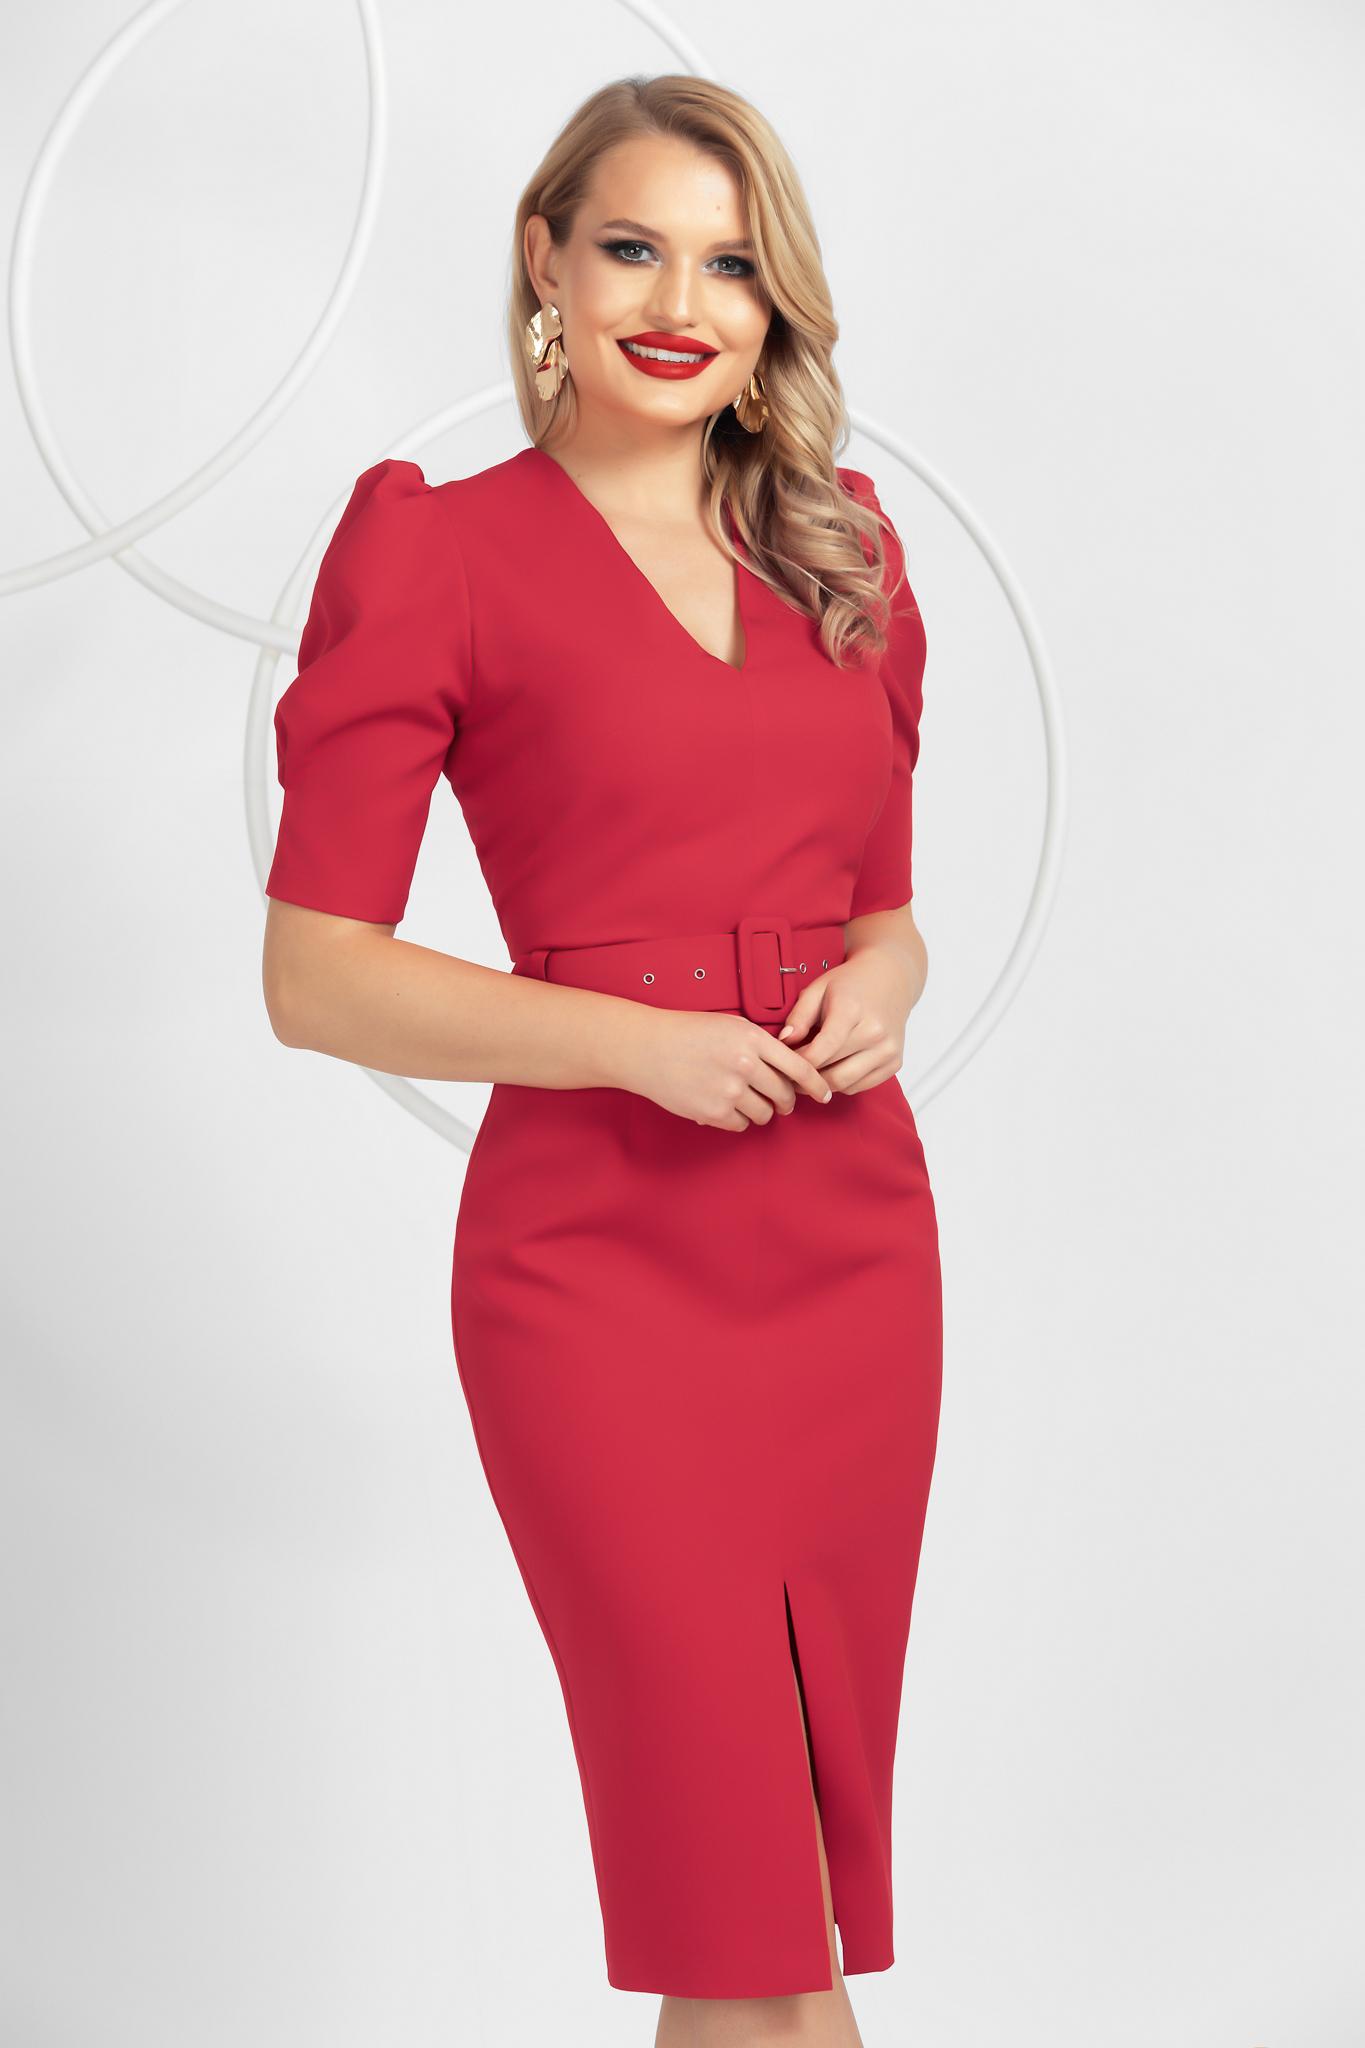 Red pencil midi dress top wrinkled sleeves frontal slit